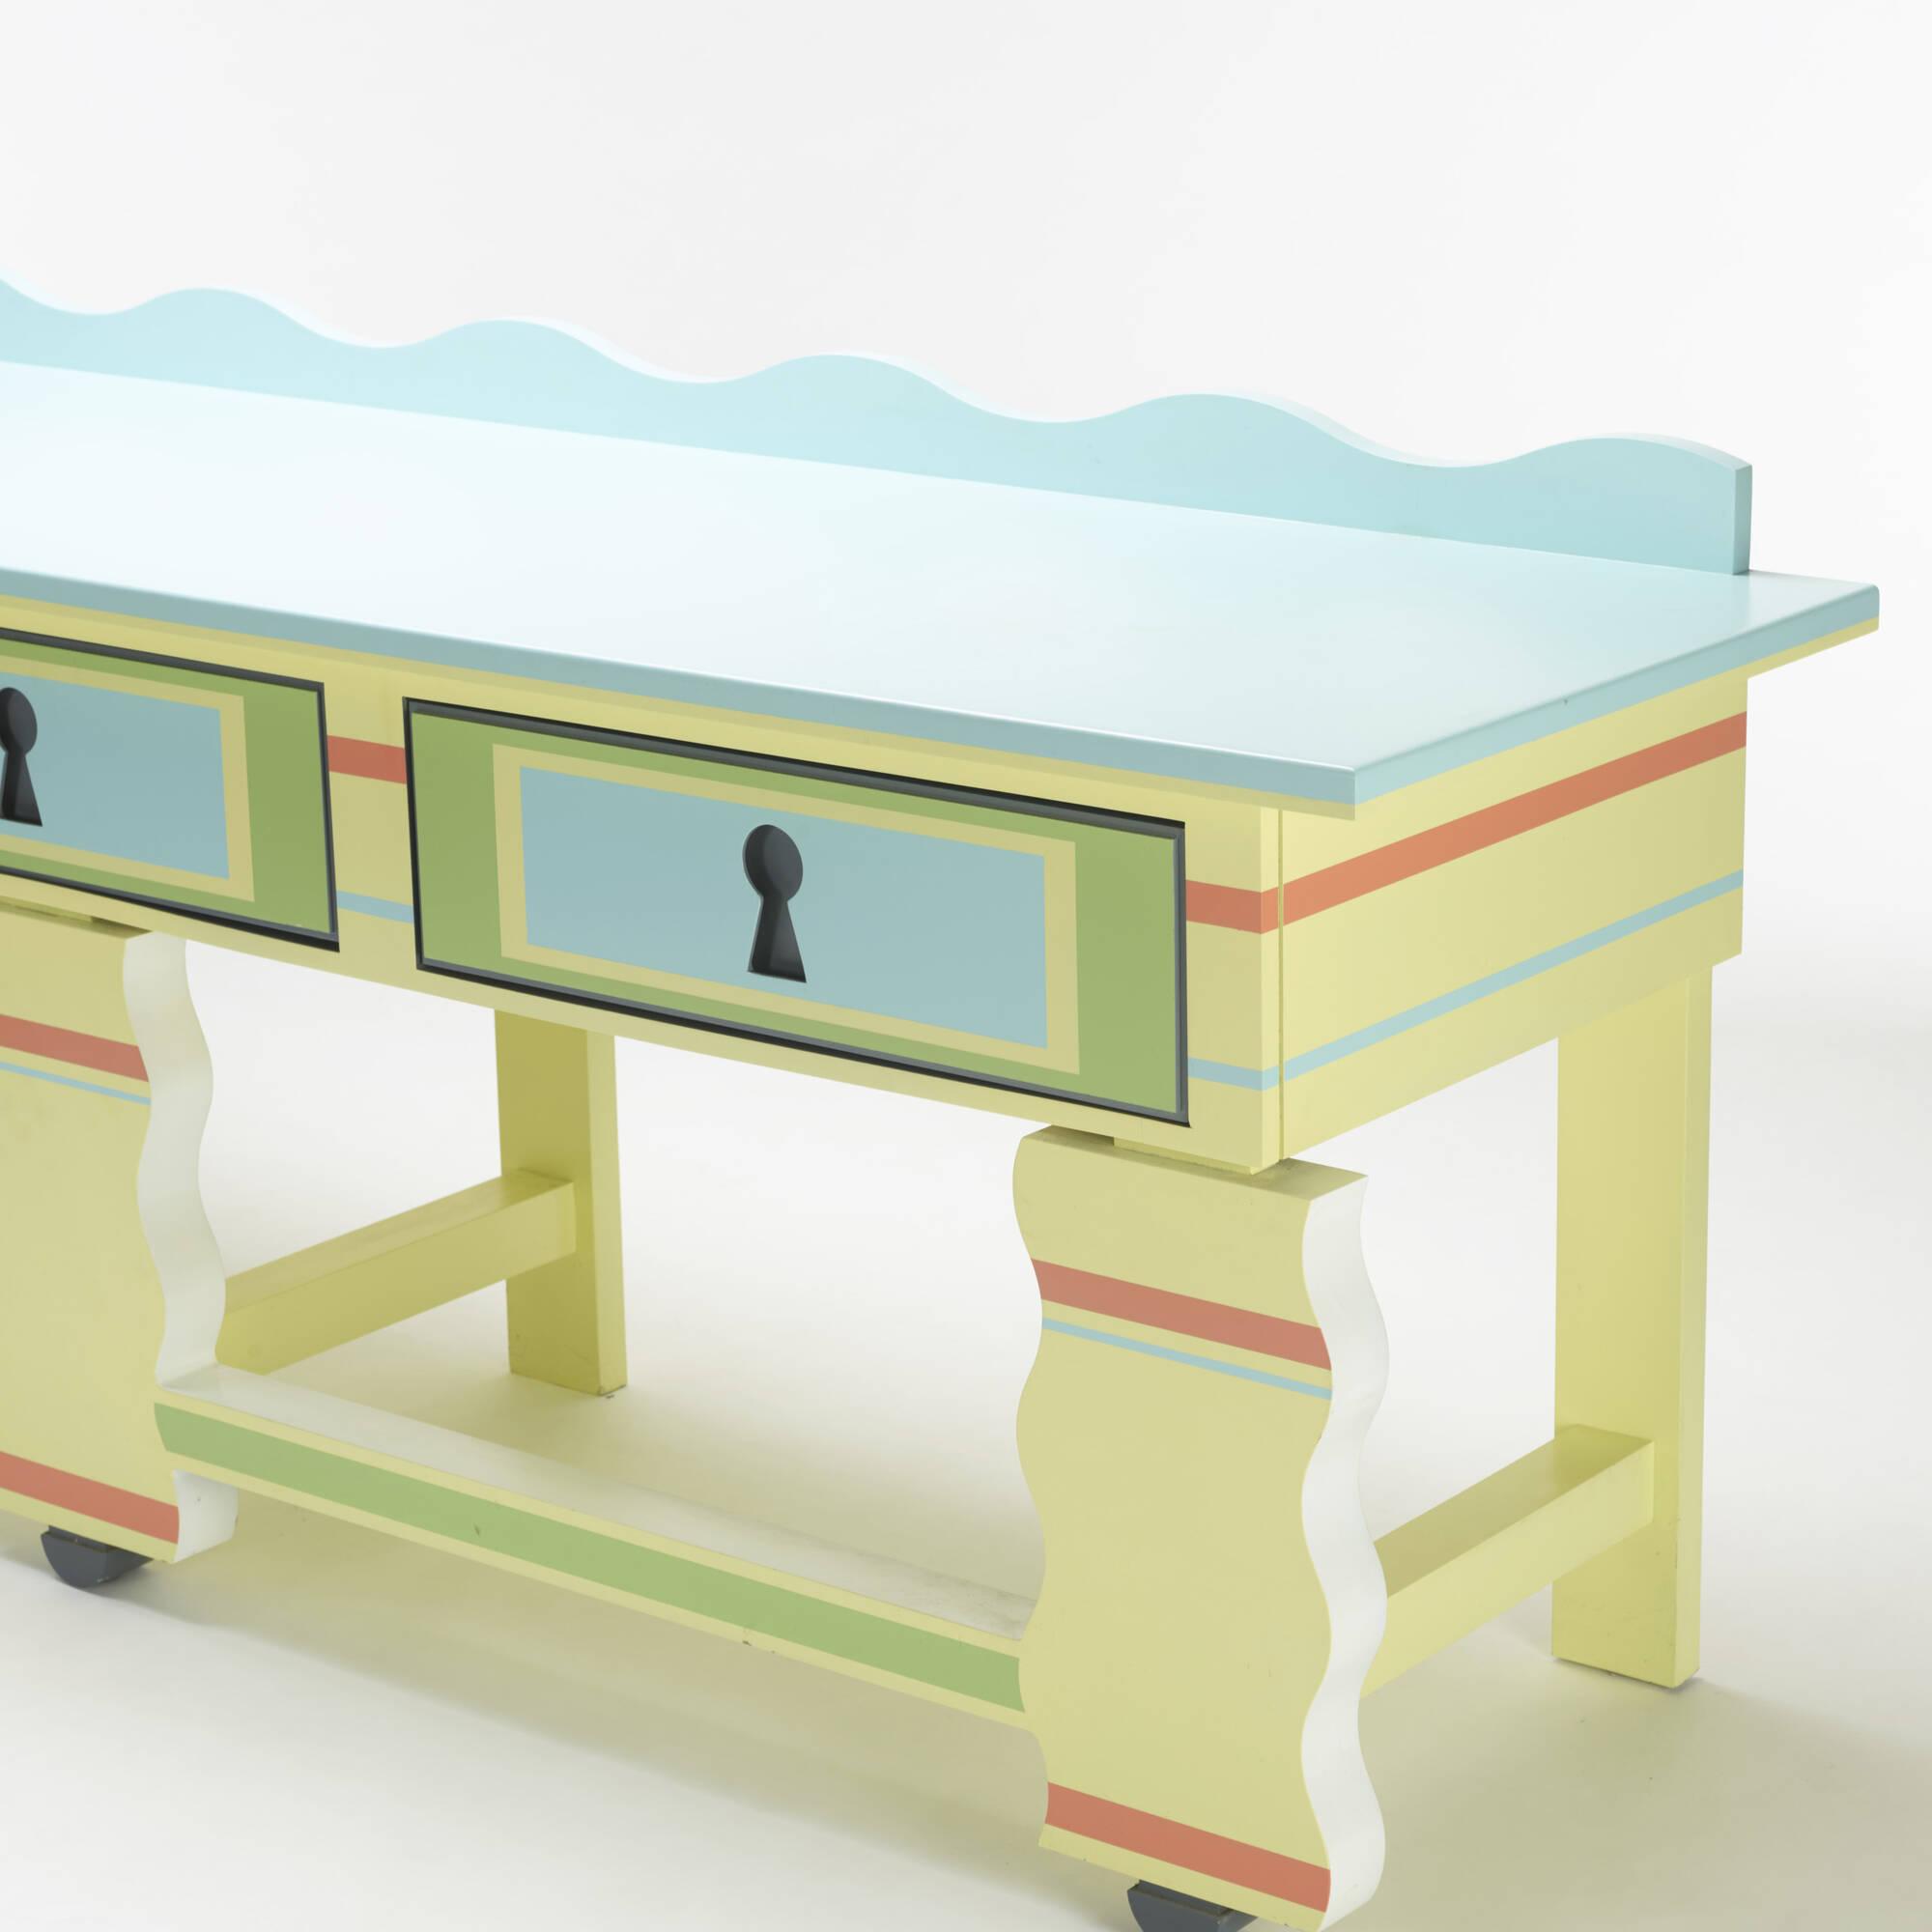 212: Robert Venturi with Denise Scott Brown / custom console (3 of 3)